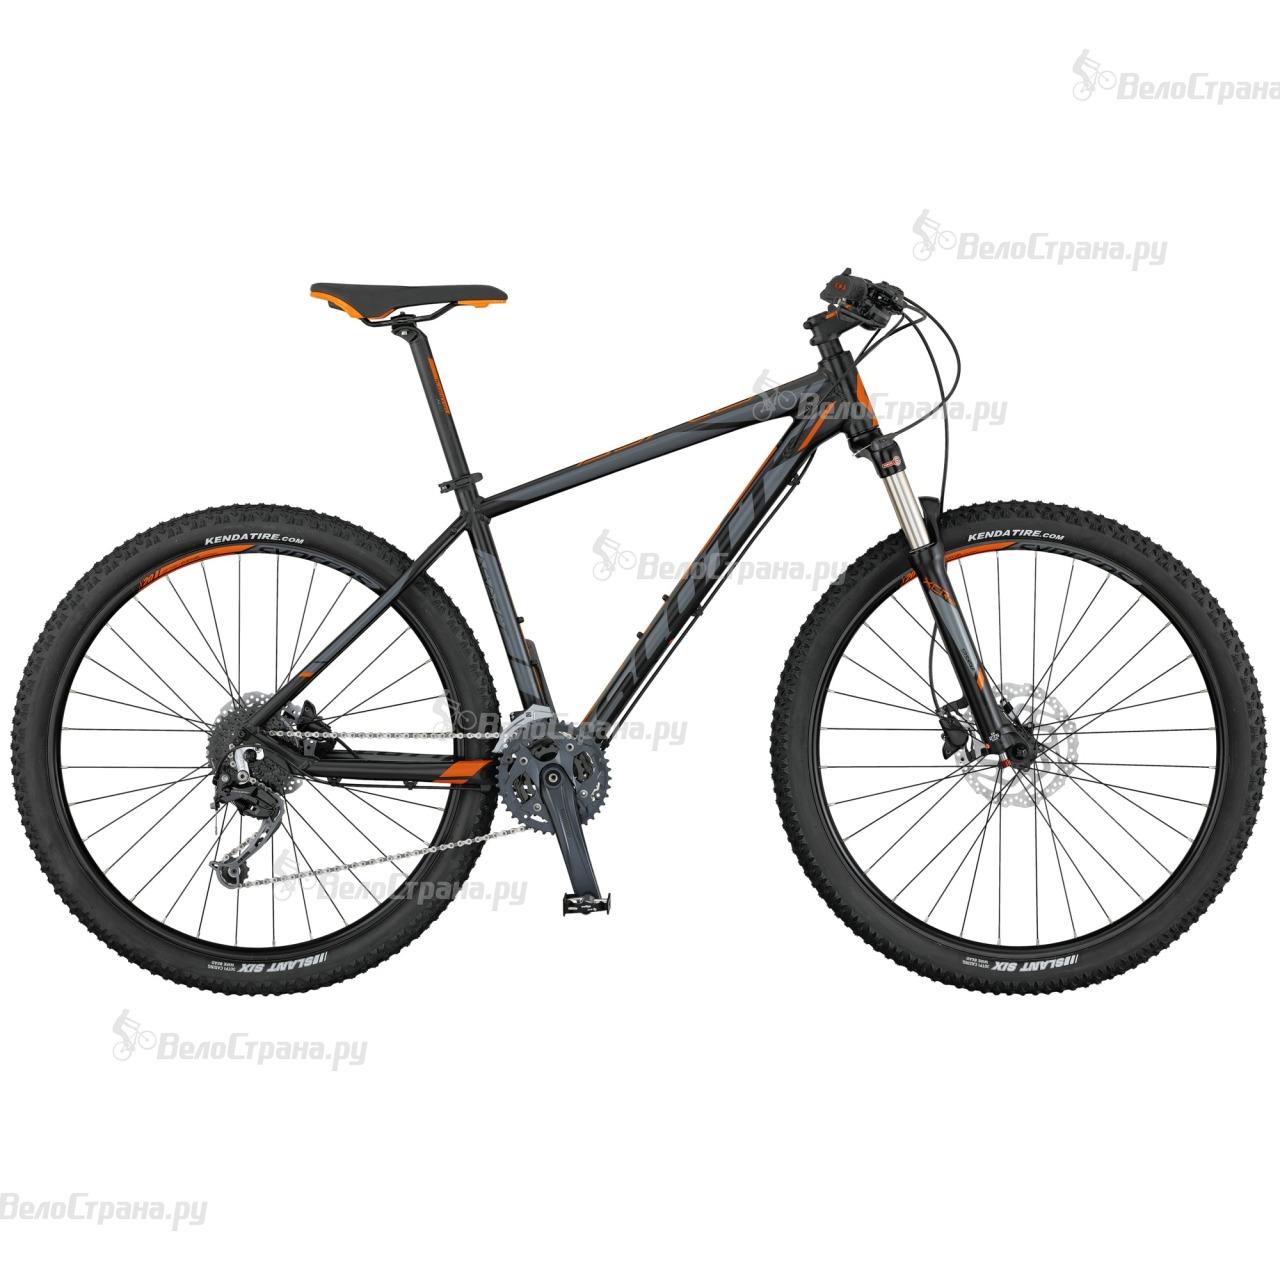 Велосипед Scott Aspect 730 (2017)